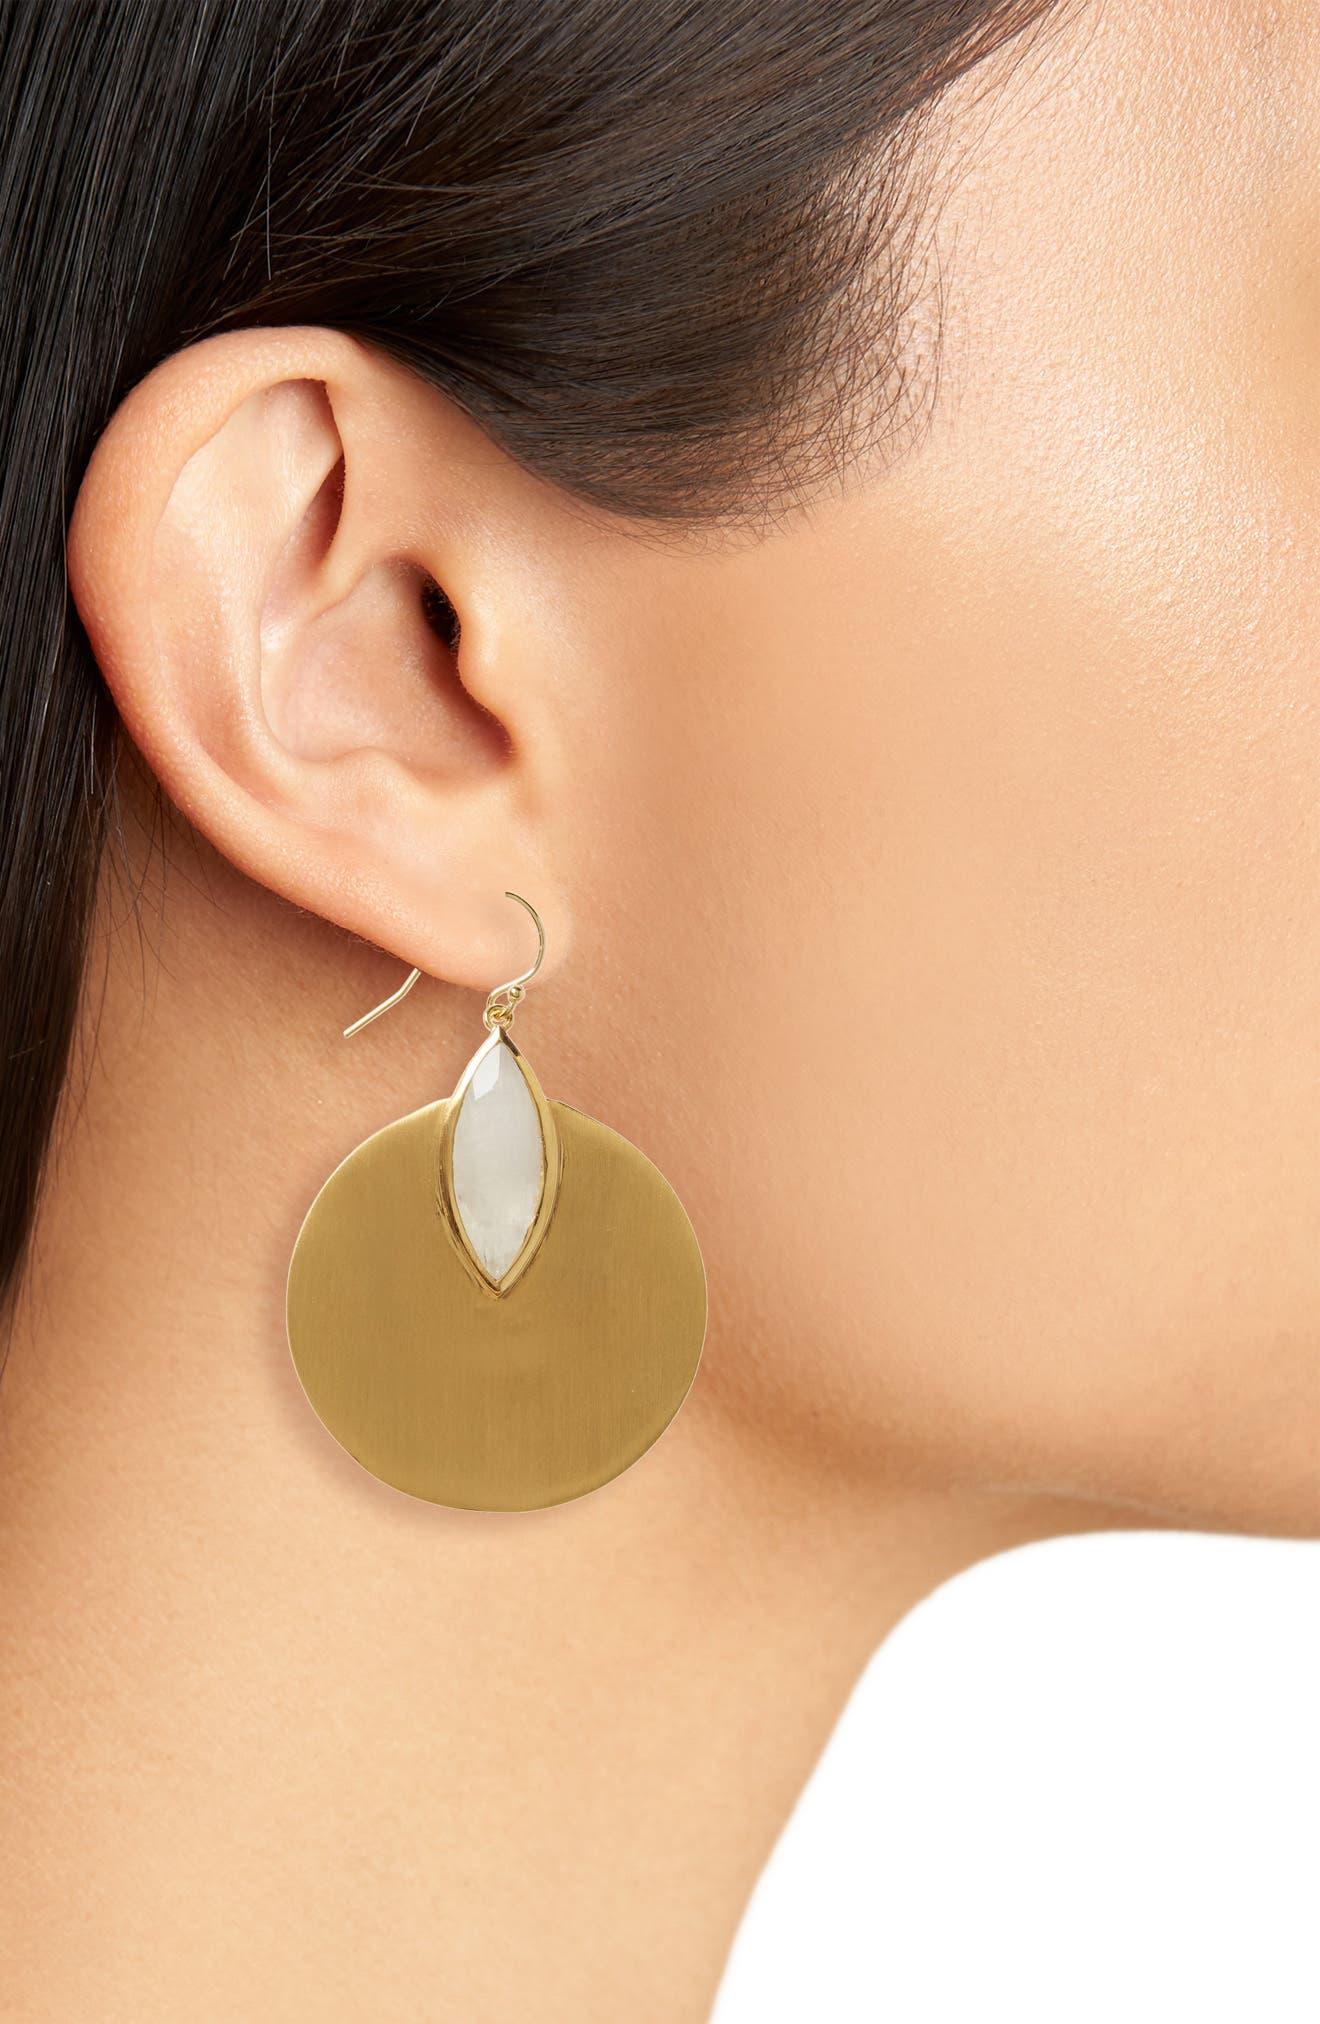 Lotus Disc Earrings,                             Alternate thumbnail 2, color,                             710